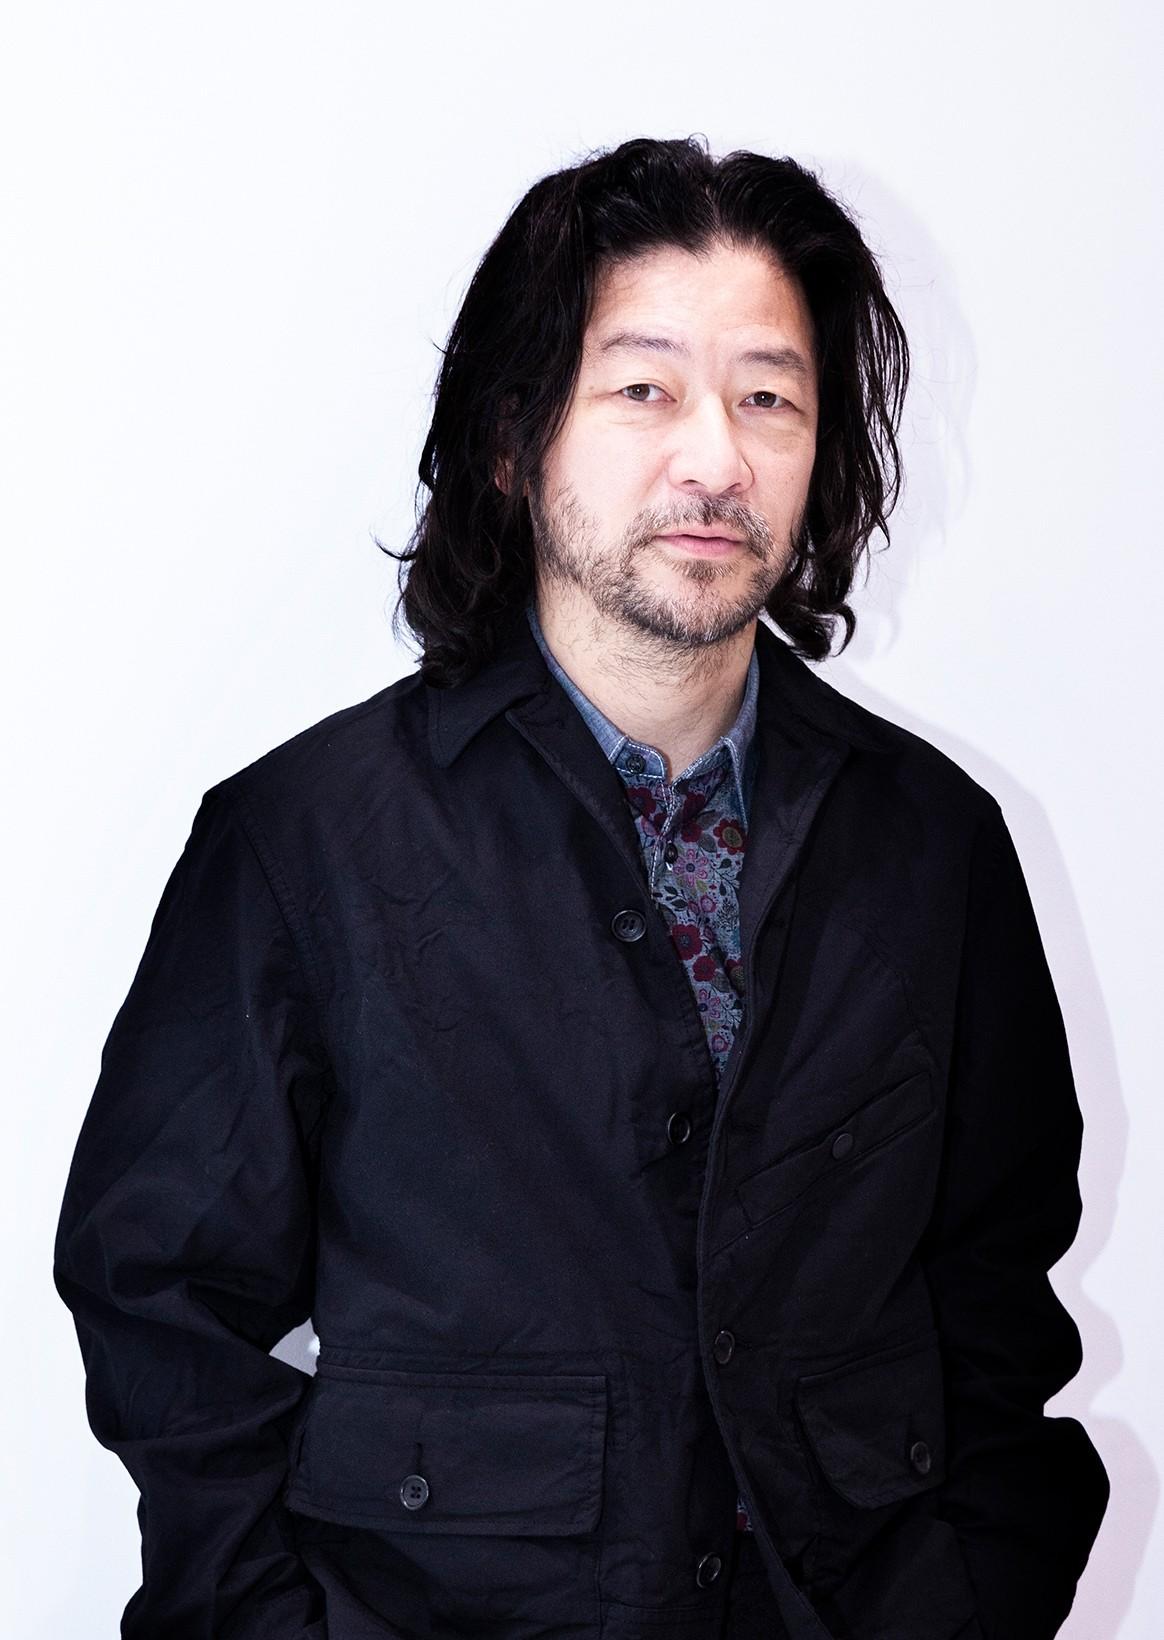 Tadanobu Asano X COMME des GARÇONS JUNYA WATANABE MAN/COMME des GARÇONS HOMME | In special space where two lines coexist